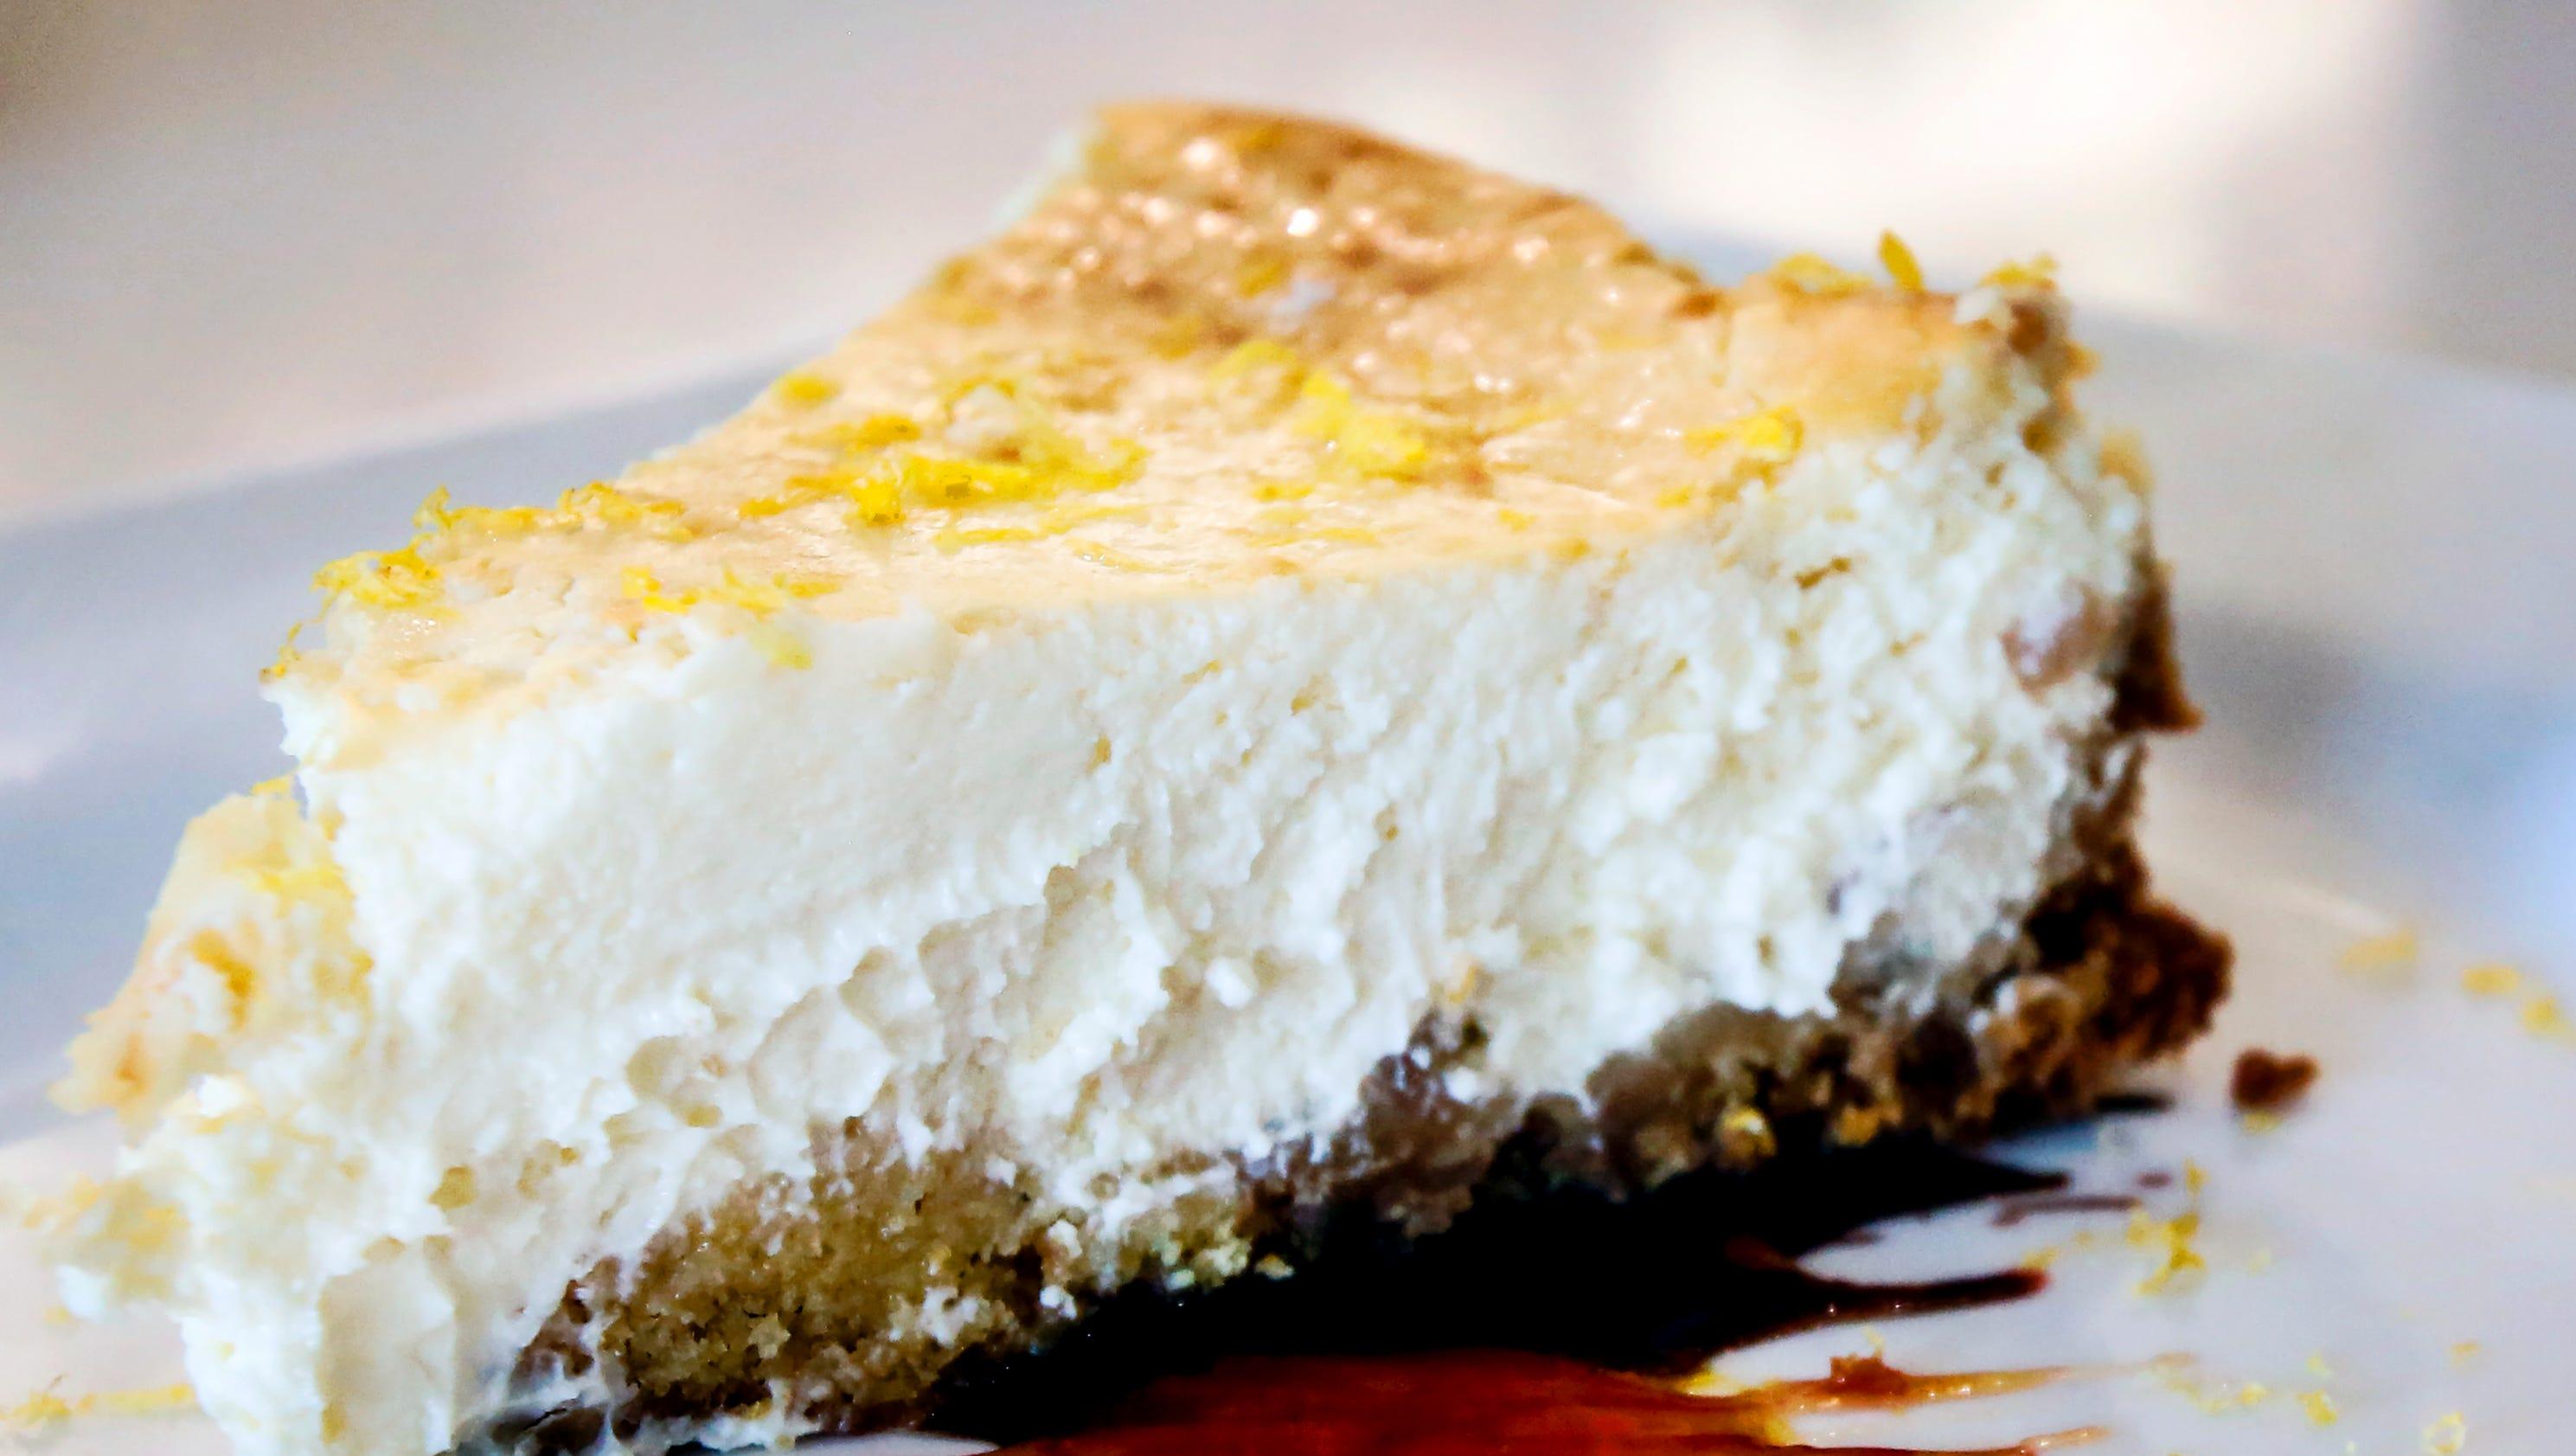 Finn\'s Southern Kitchen: How to make bourbon barrel cheesecake ...